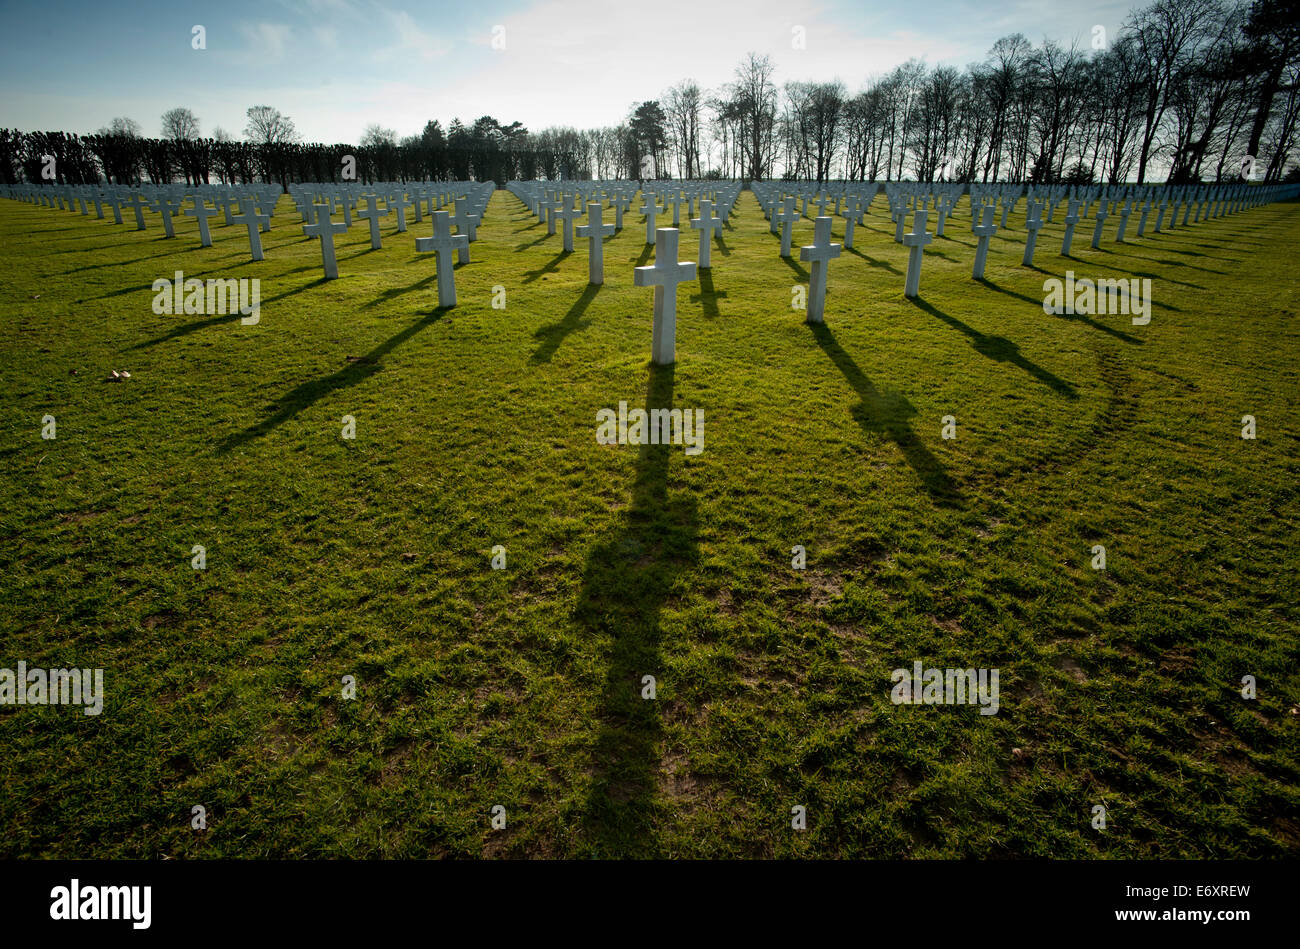 St Mihiel American Cemetery and Memorial, Thiaucourt,Saint-Mihiel Salient Battlefield France. March 2014 - Stock Image